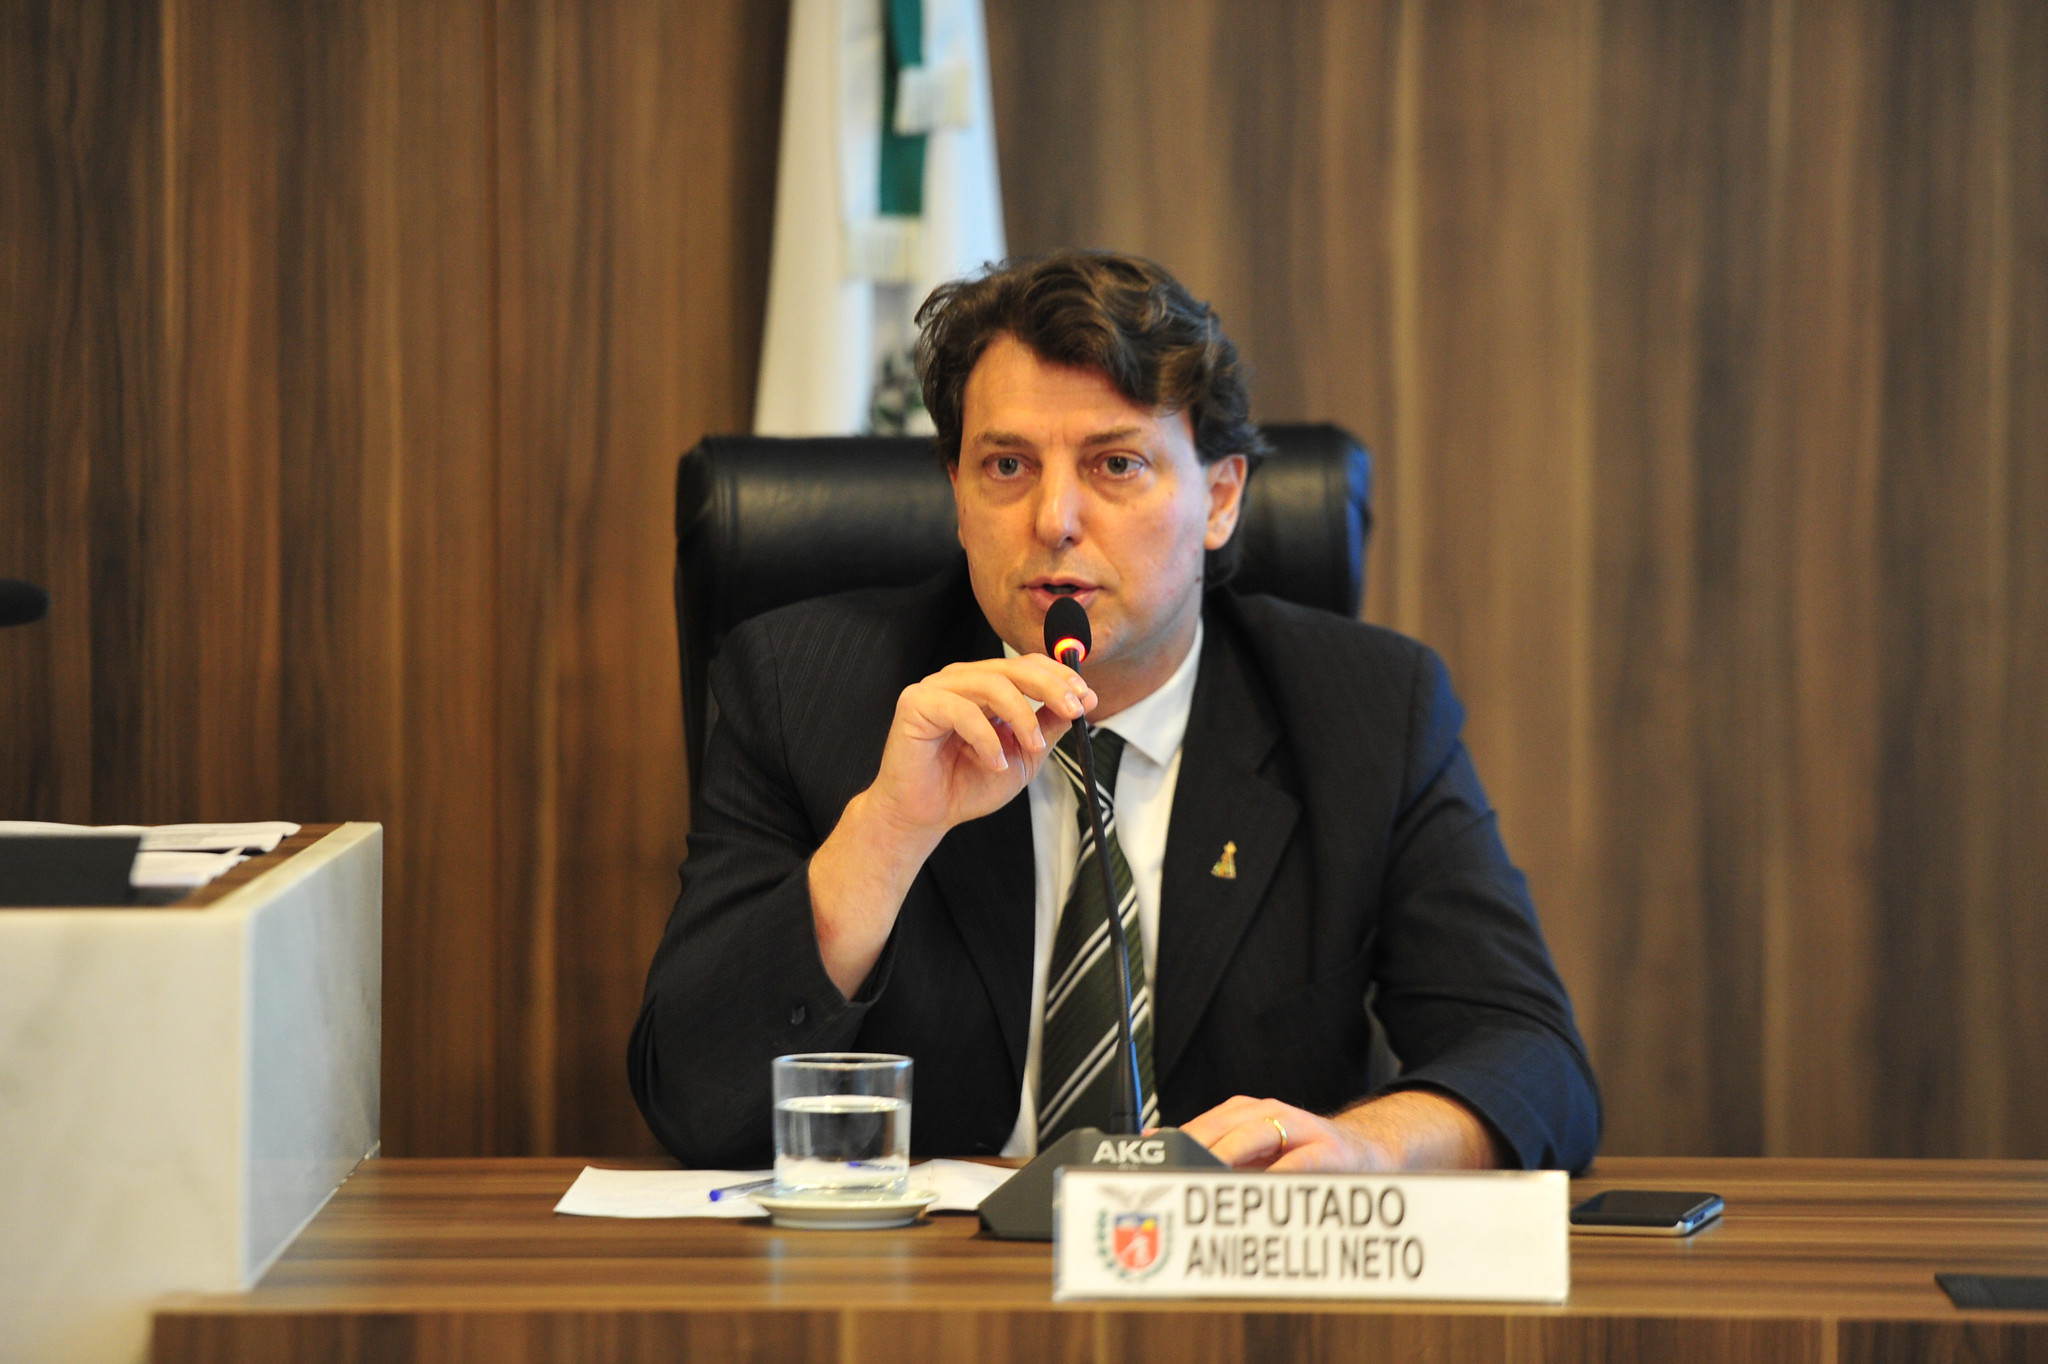 PEC de Anibelli Neto permite consórcios de municípios